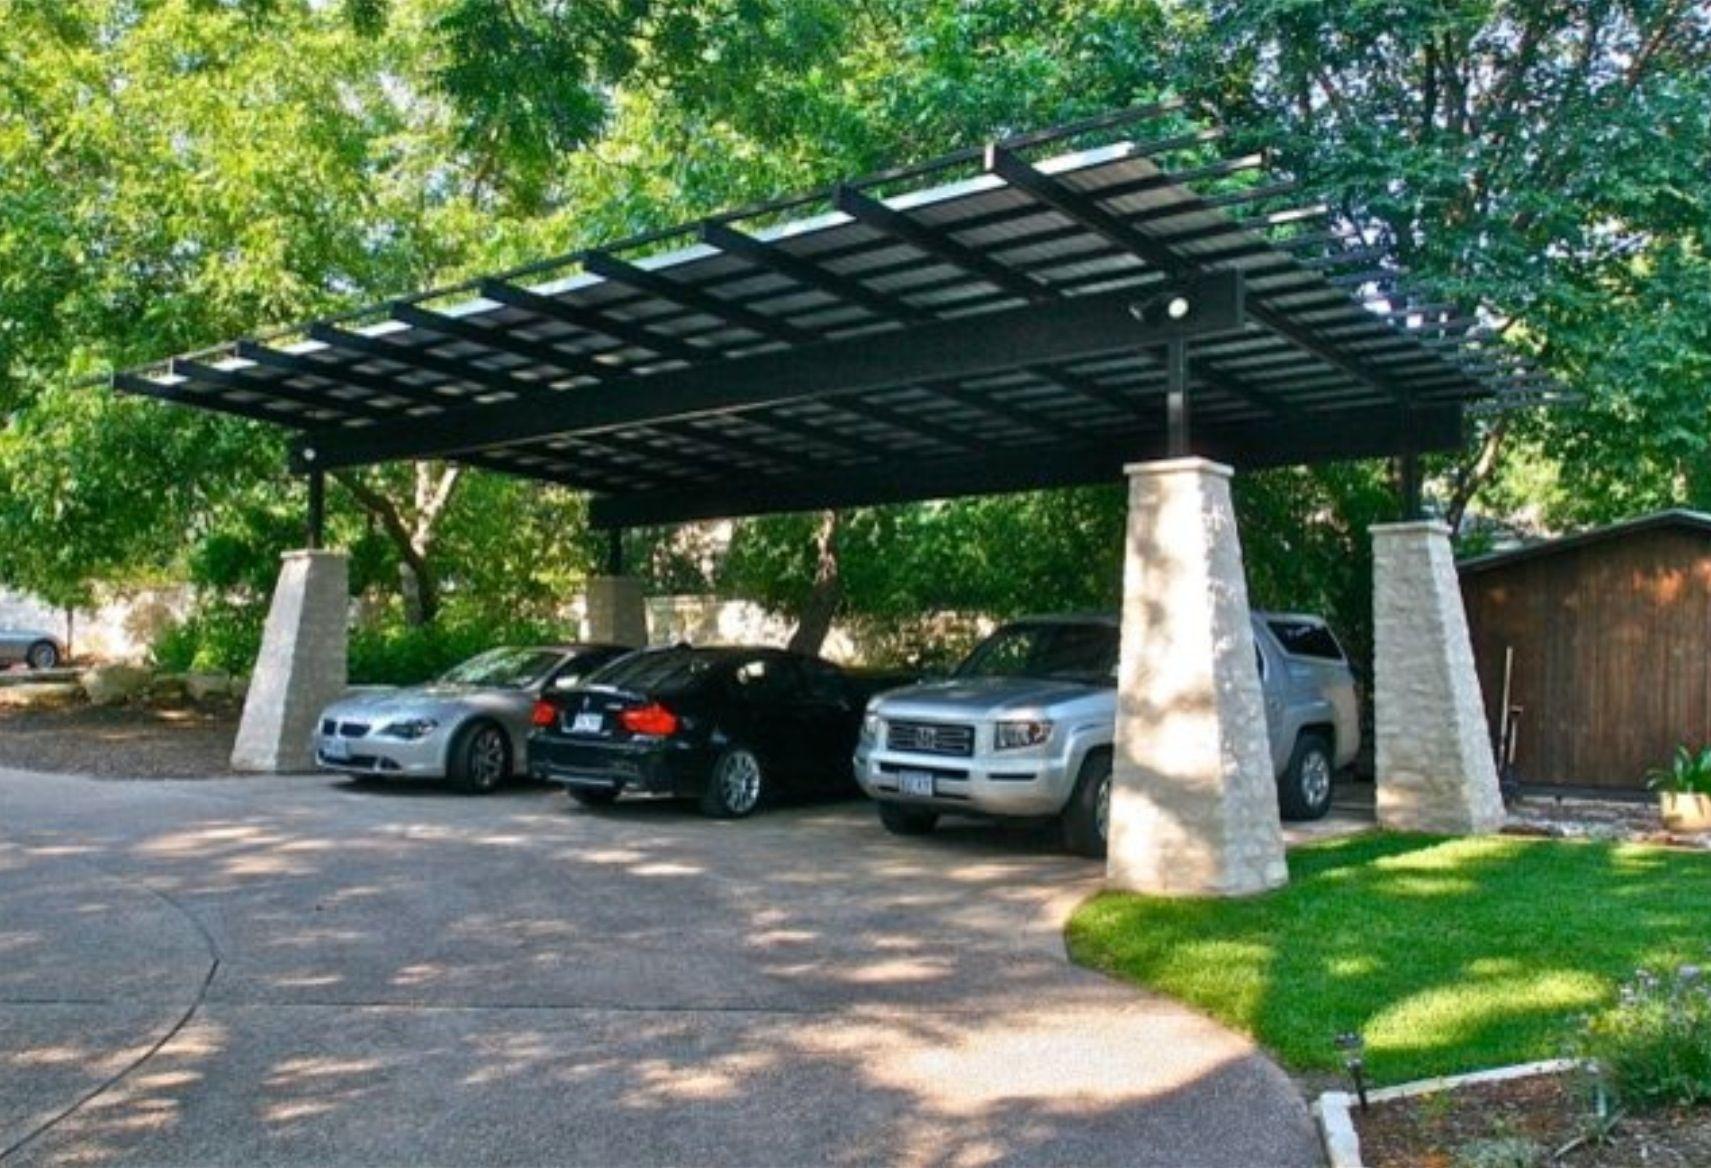 Carport | Modern carport, Carport designs, Lake house